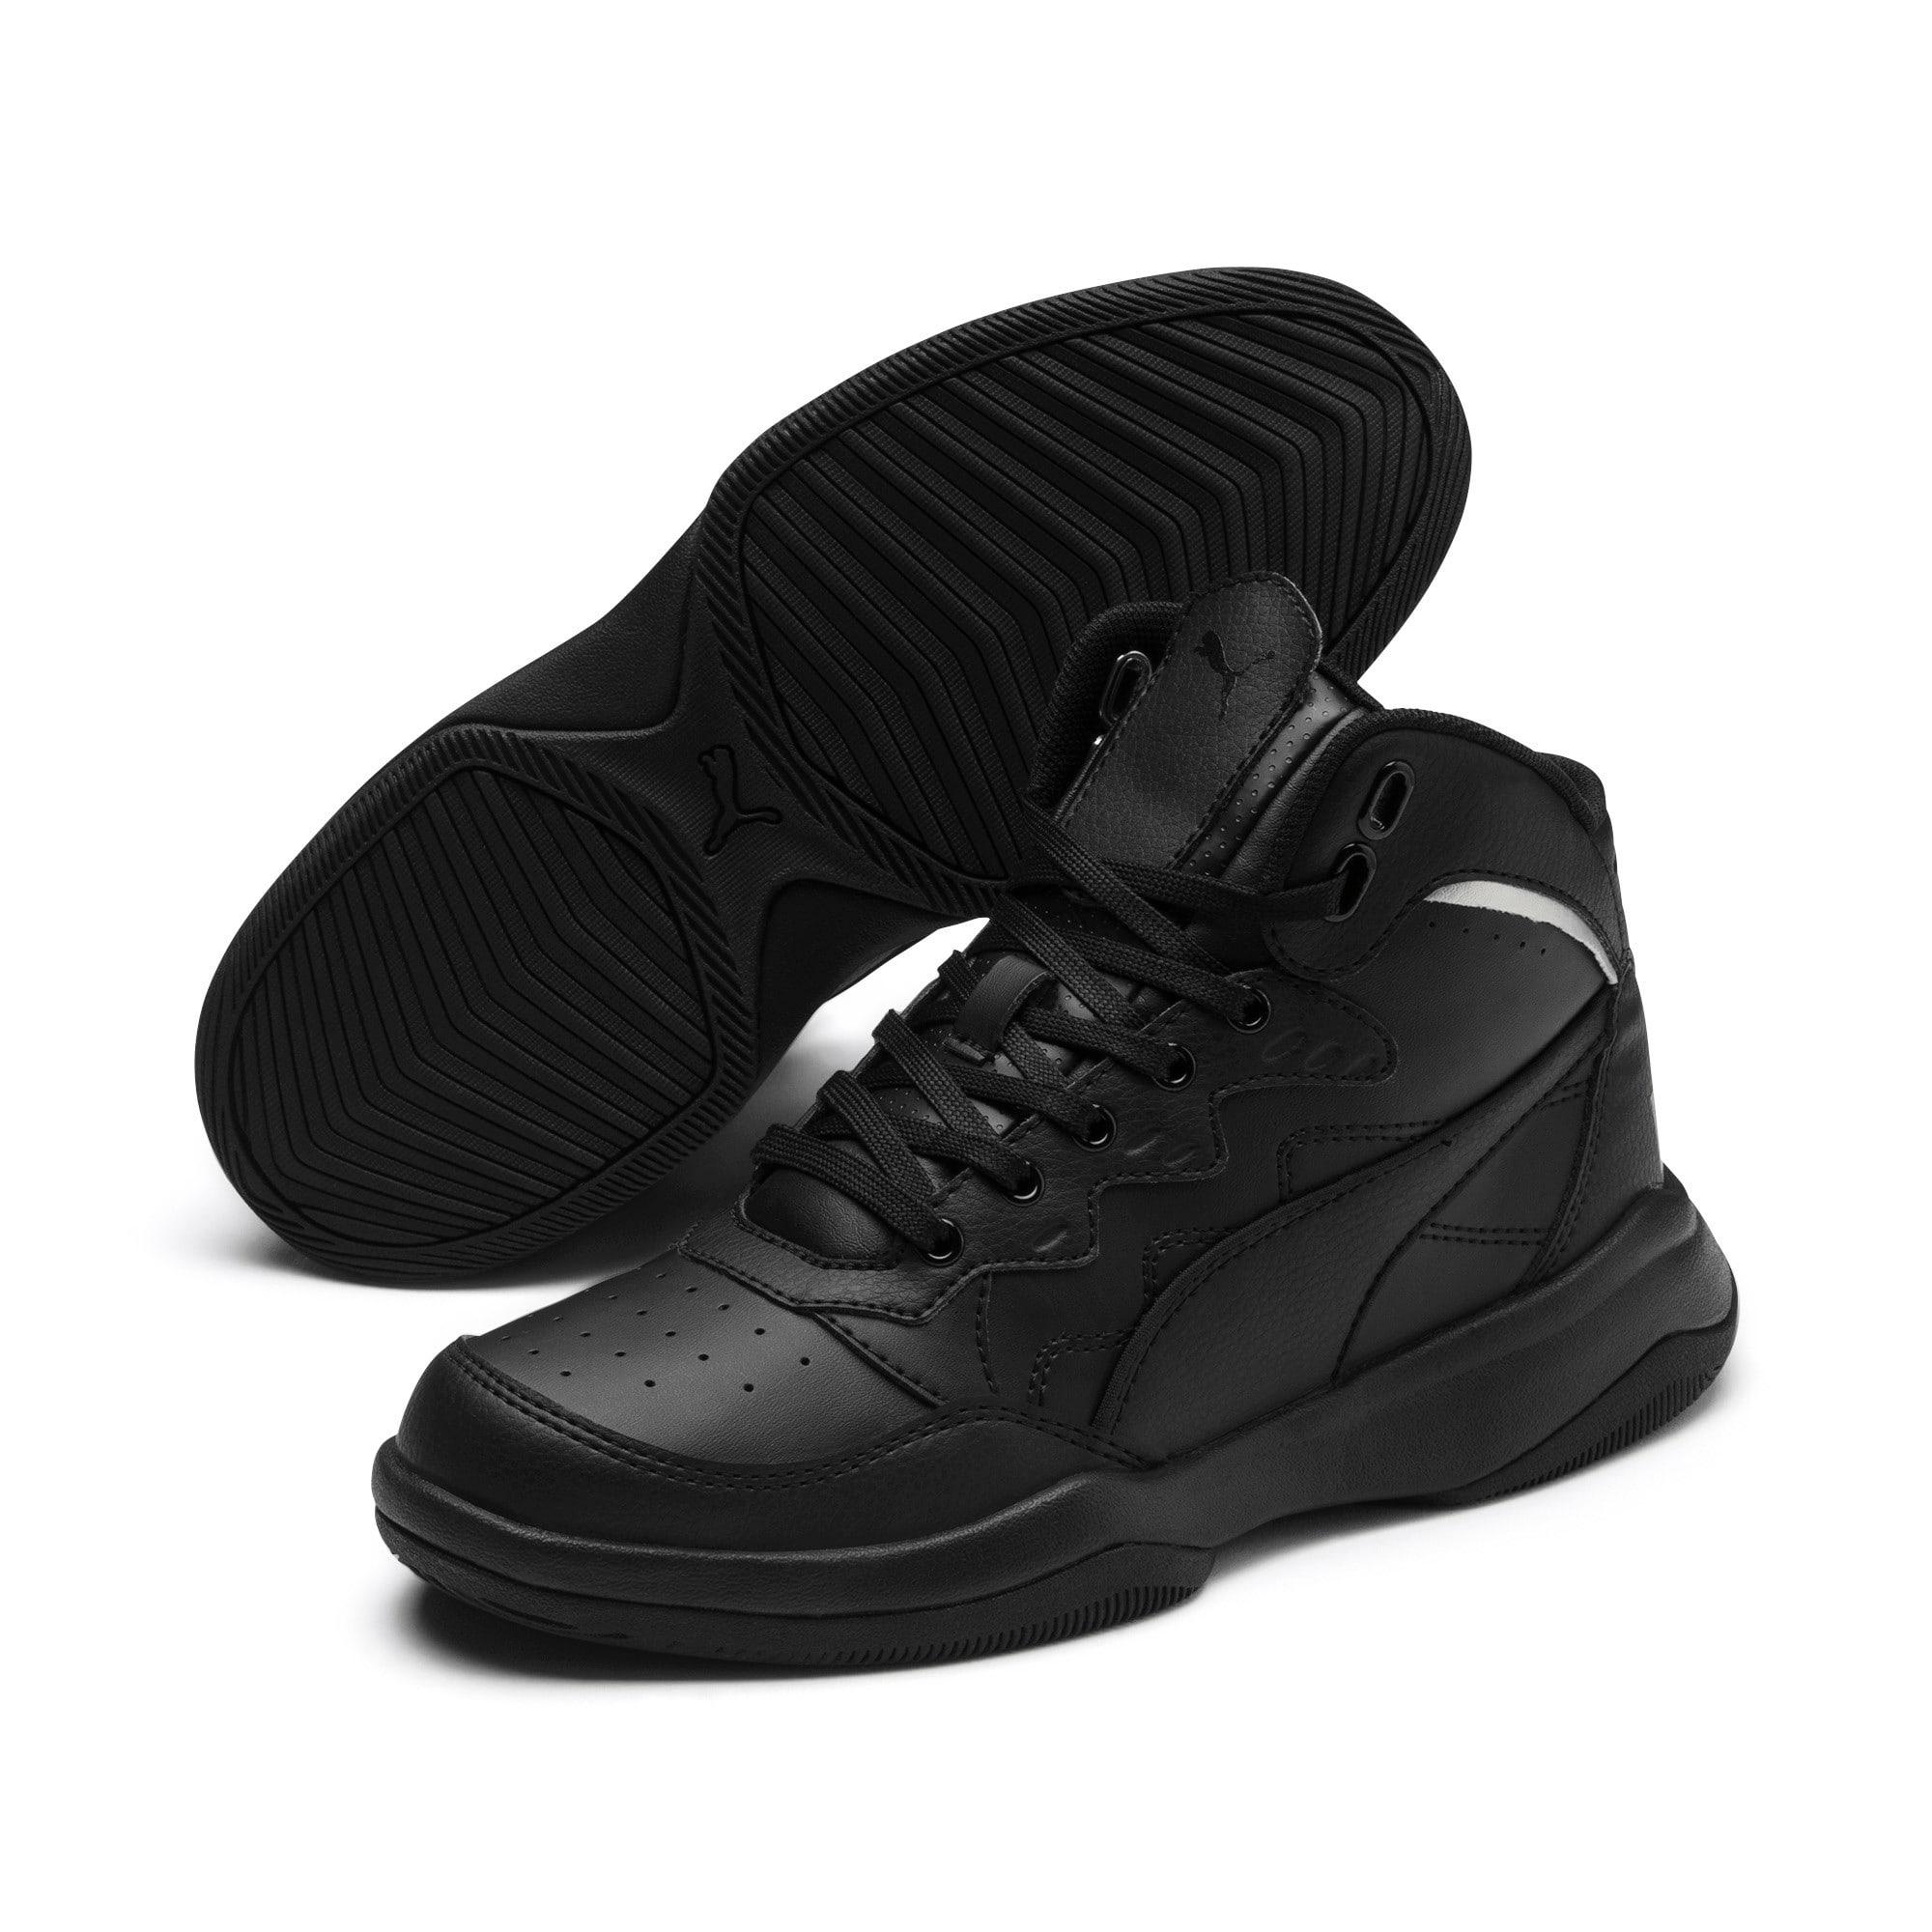 Thumbnail 2 of PUMA Rebound Playoff SL Sneakers JR, Puma Black-Puma Silver, medium